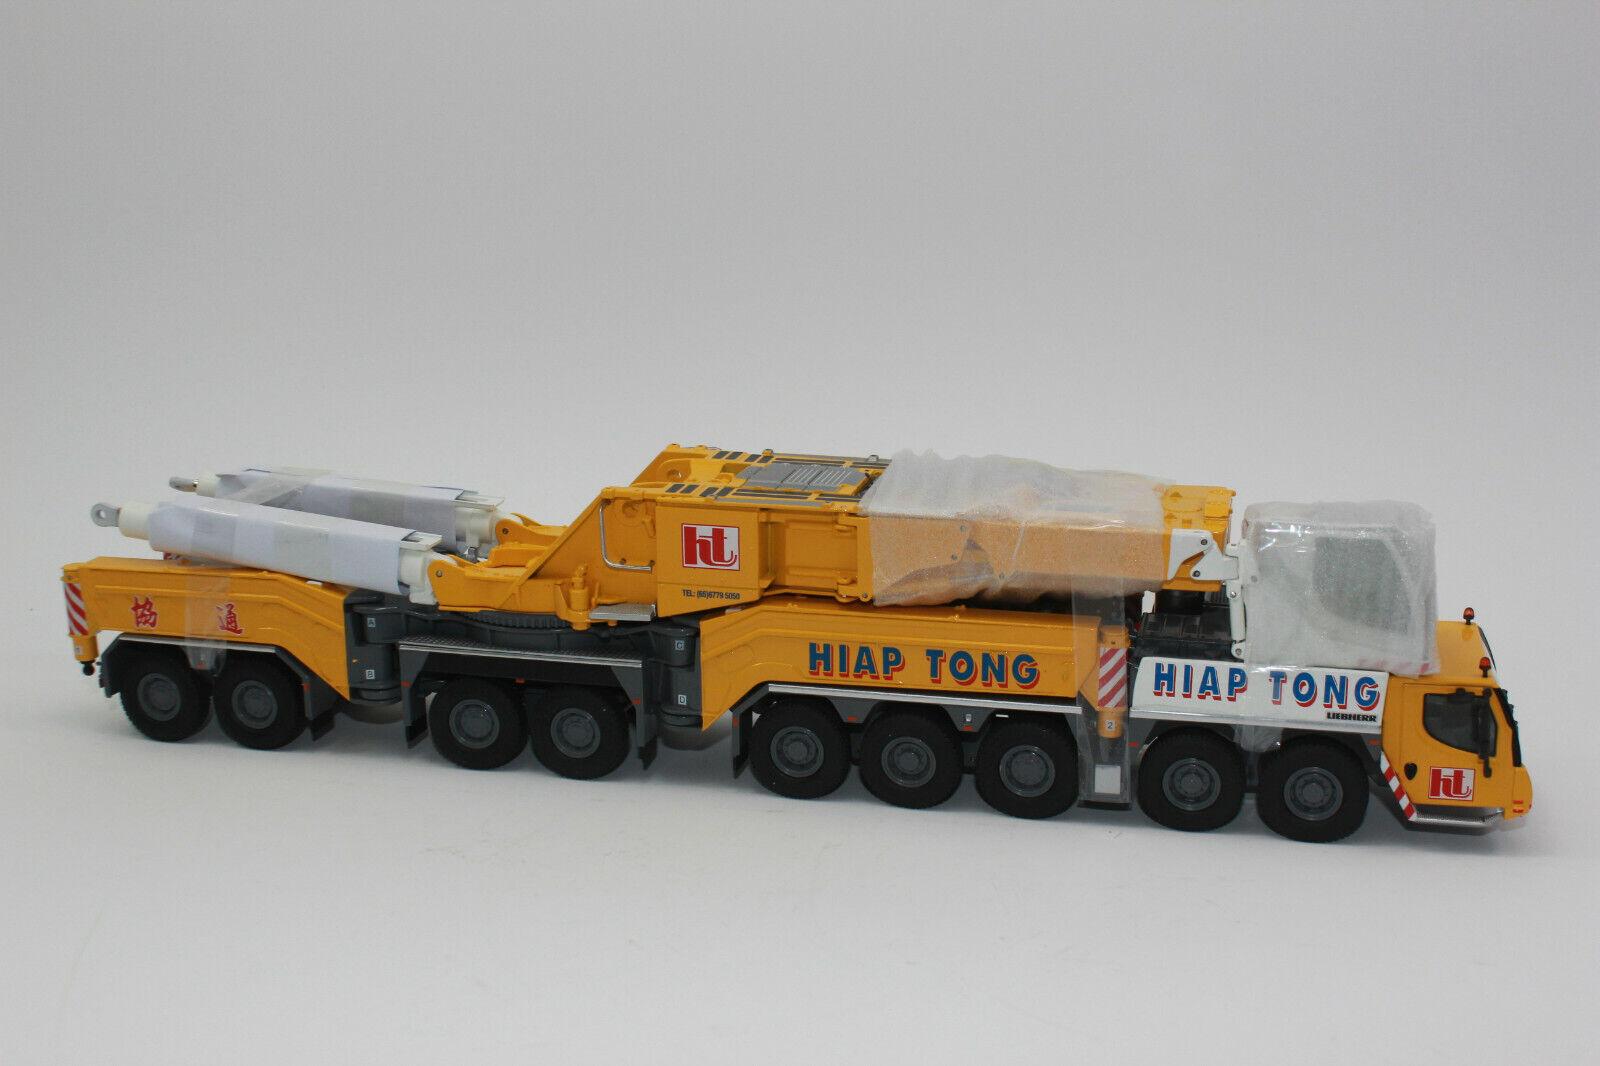 Nzg 732 29 Liebherr Ltm 11200-9.1 Hiap Tong Mobile Crane New Limited 150 Pcs.